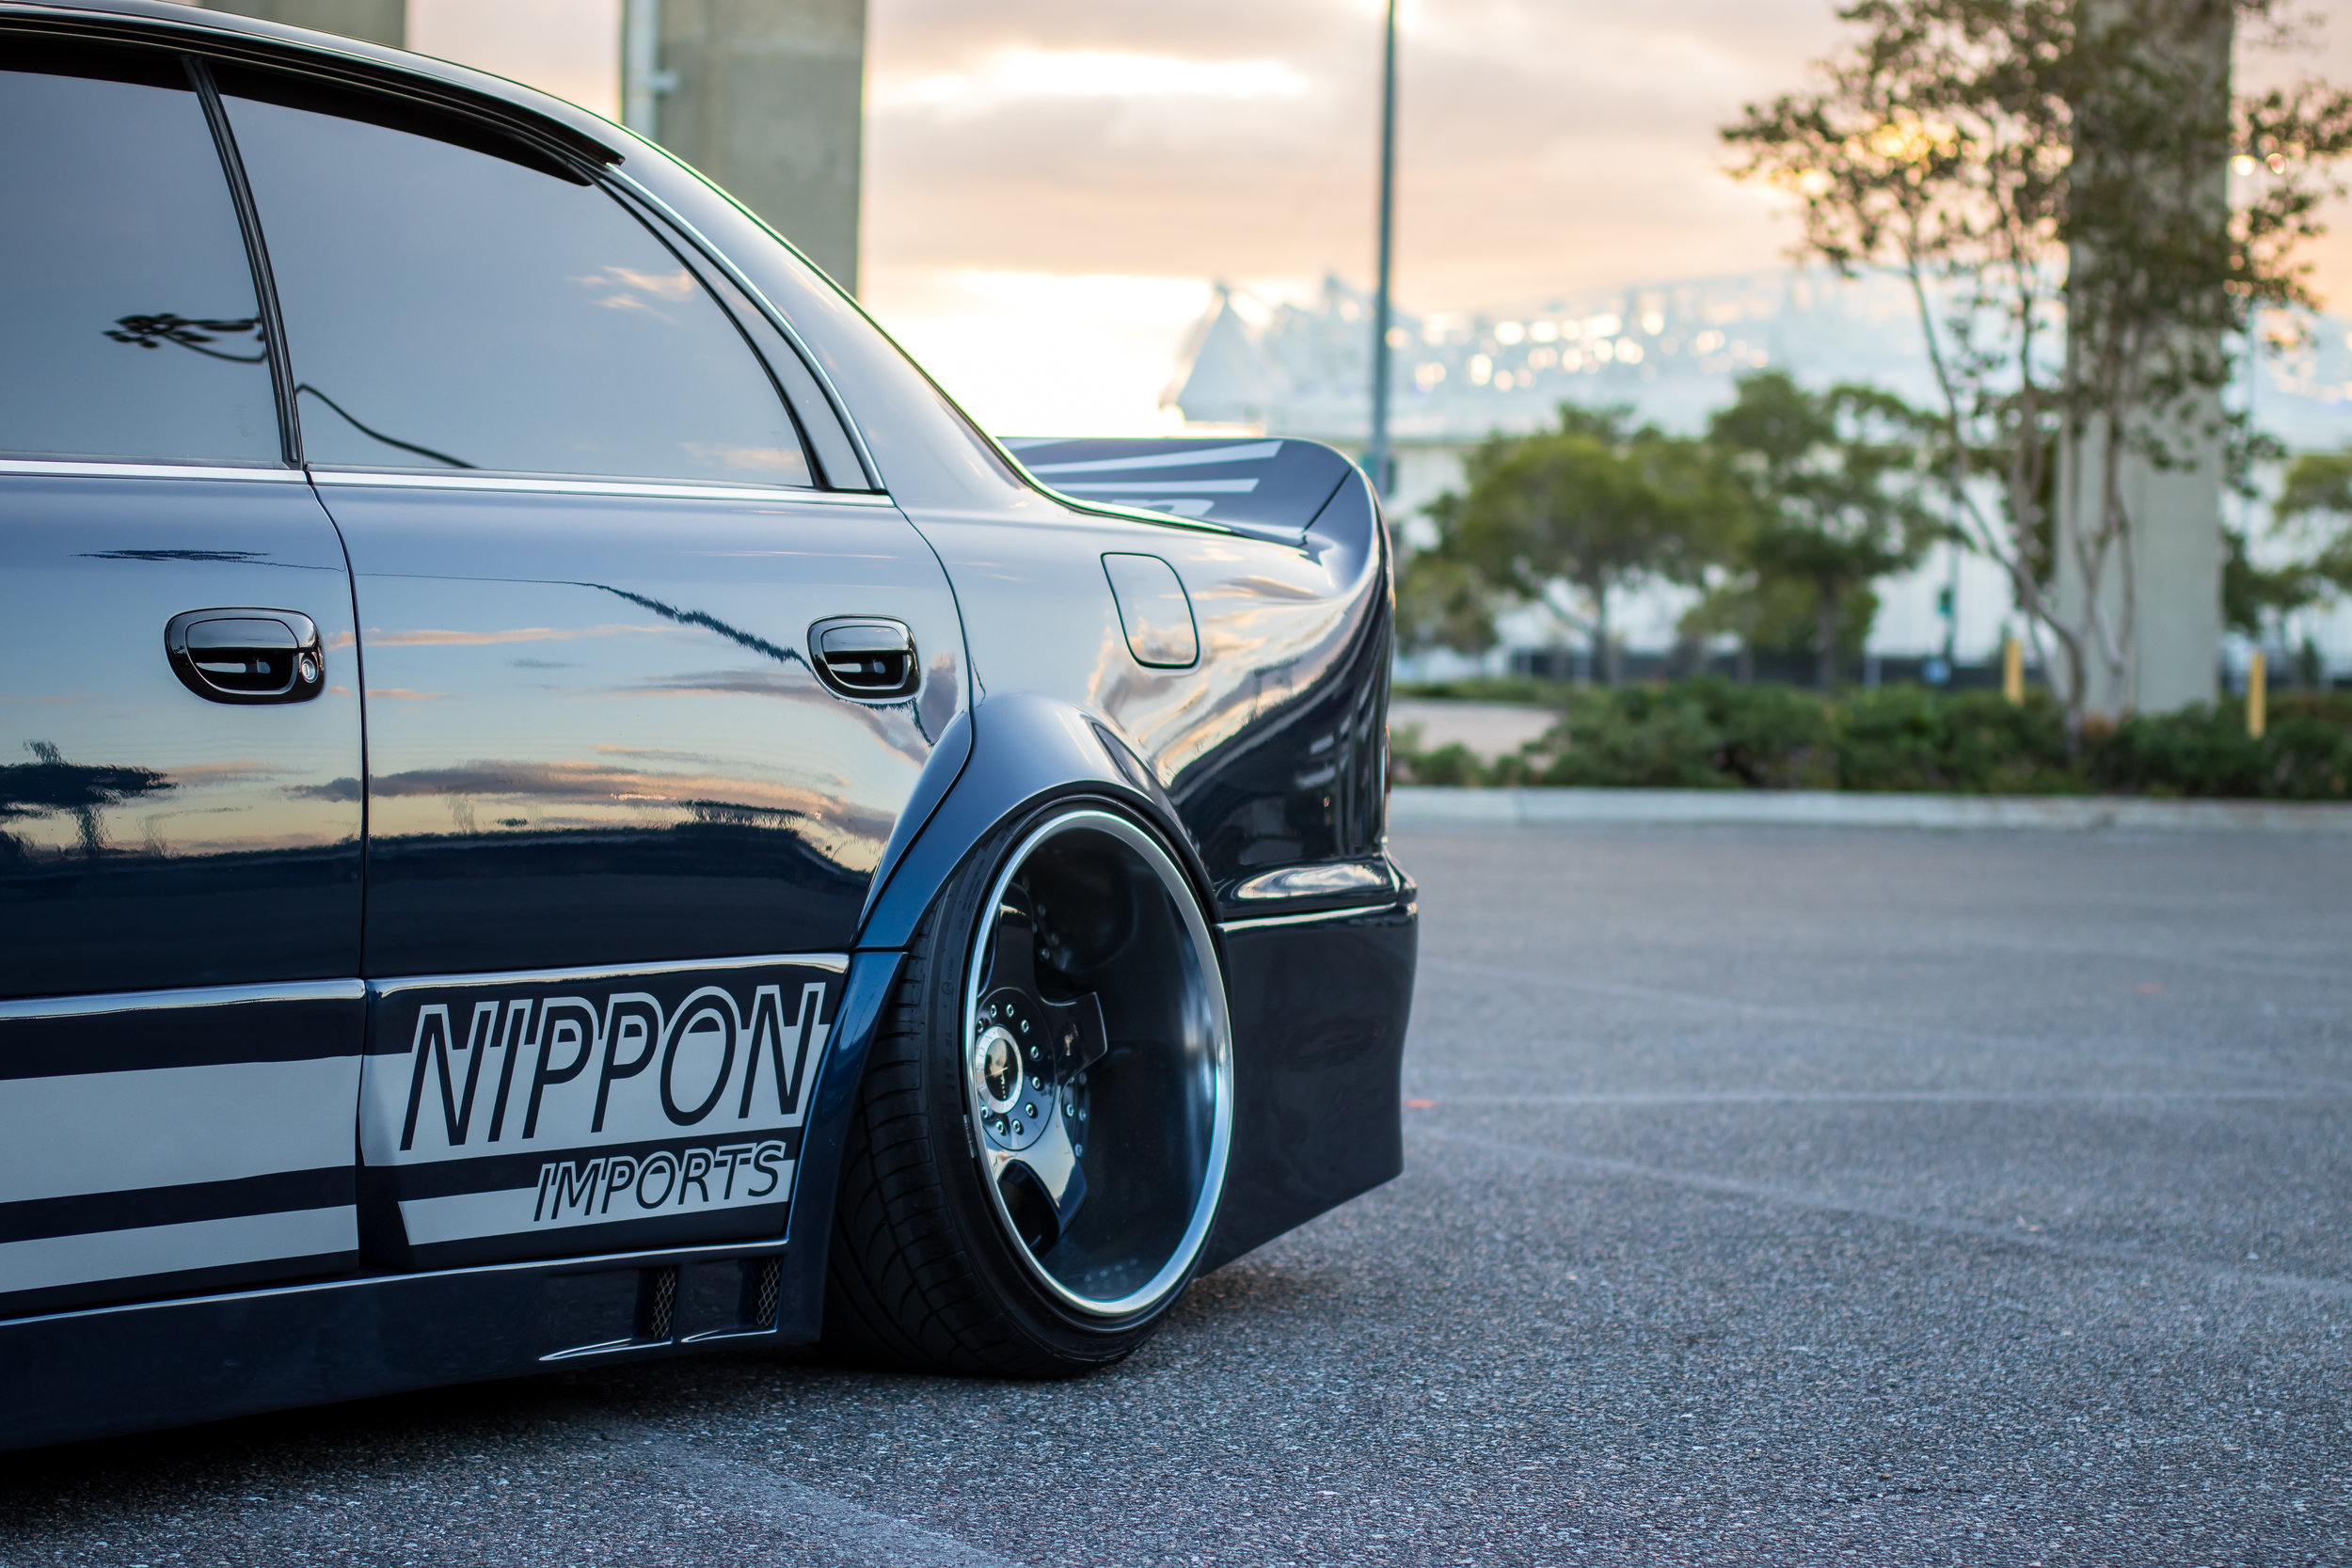 nippon-imports-toyota-crown_40176269780_o.jpg